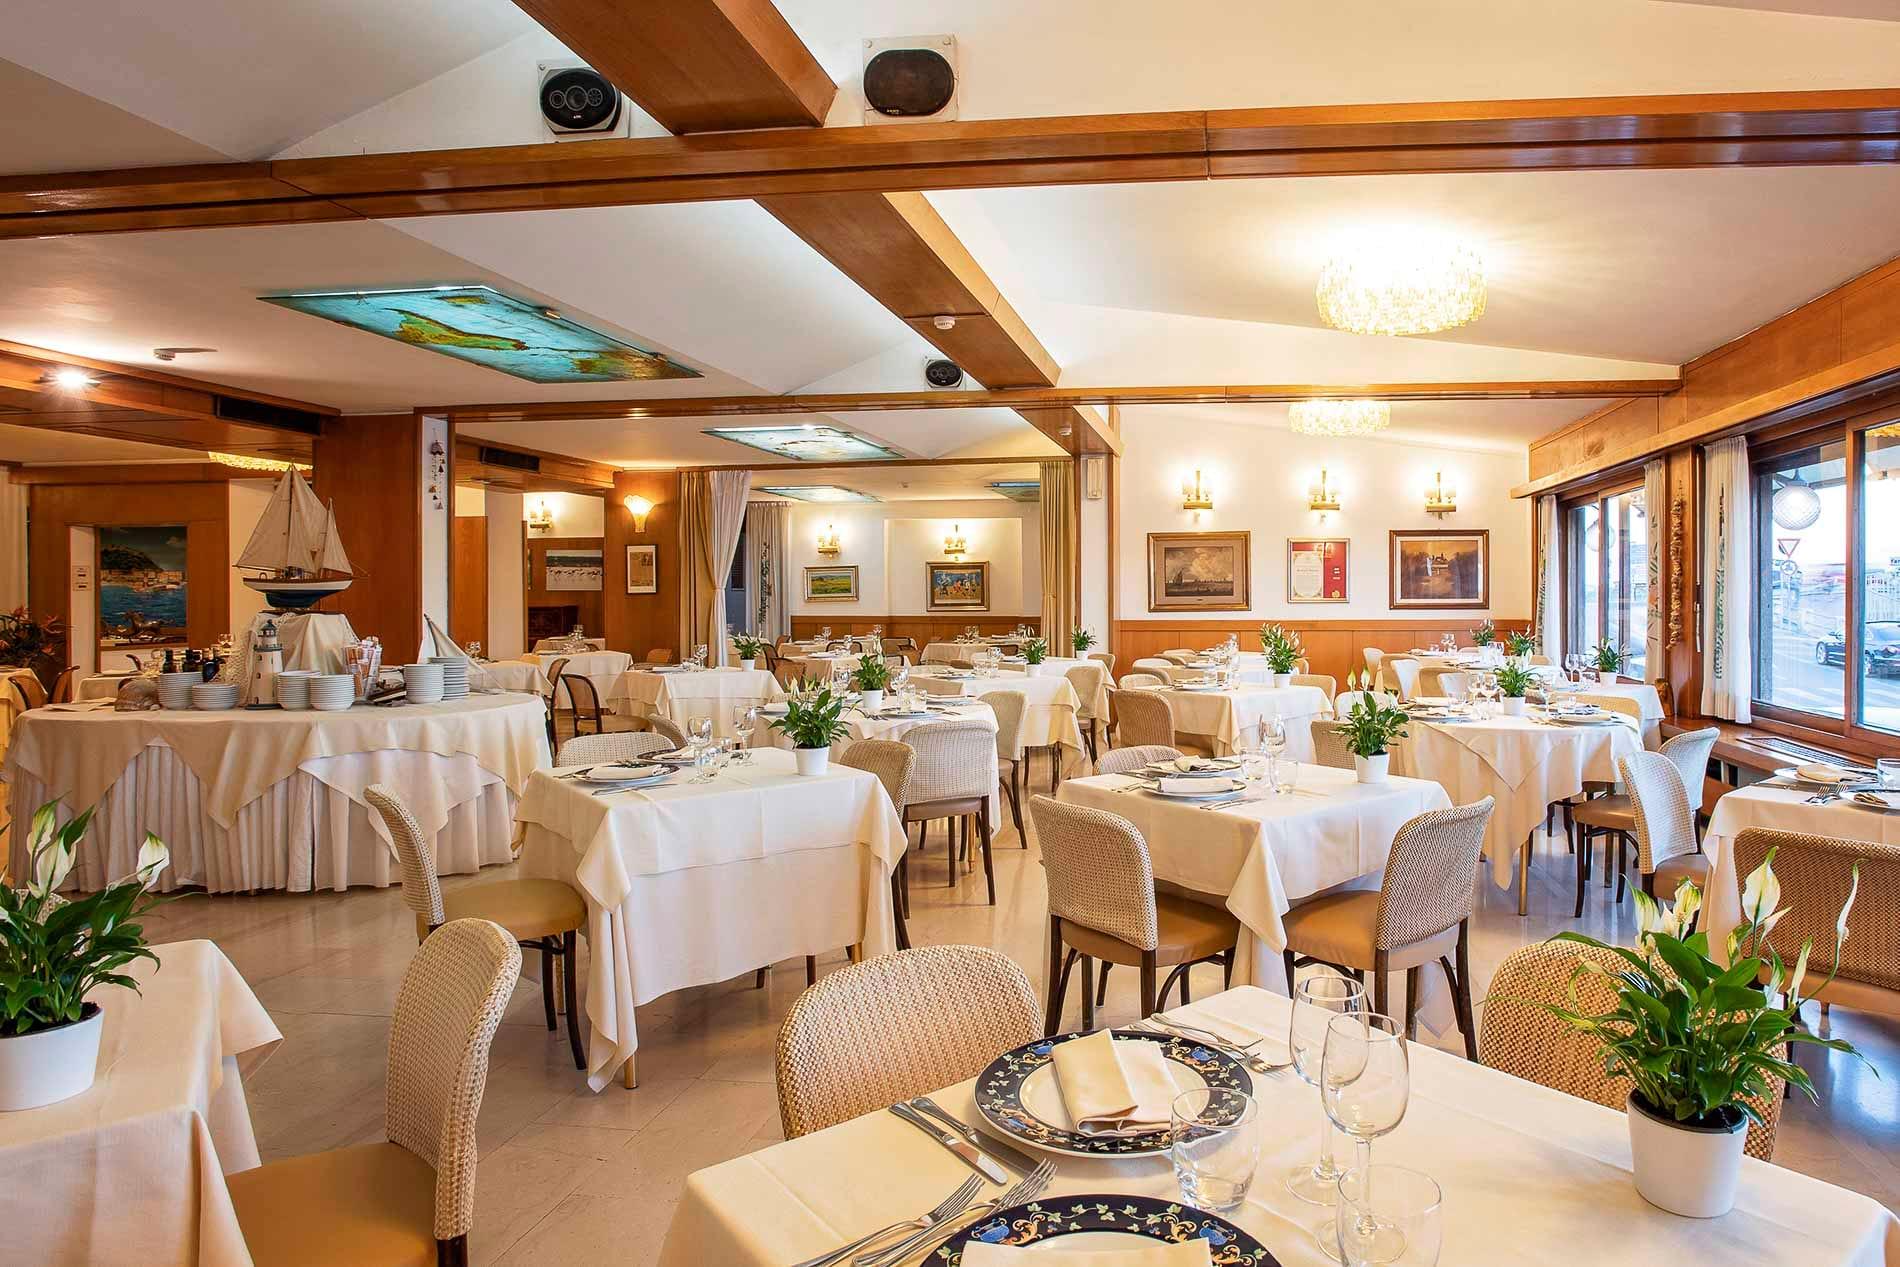 ristorante labitta gallery image